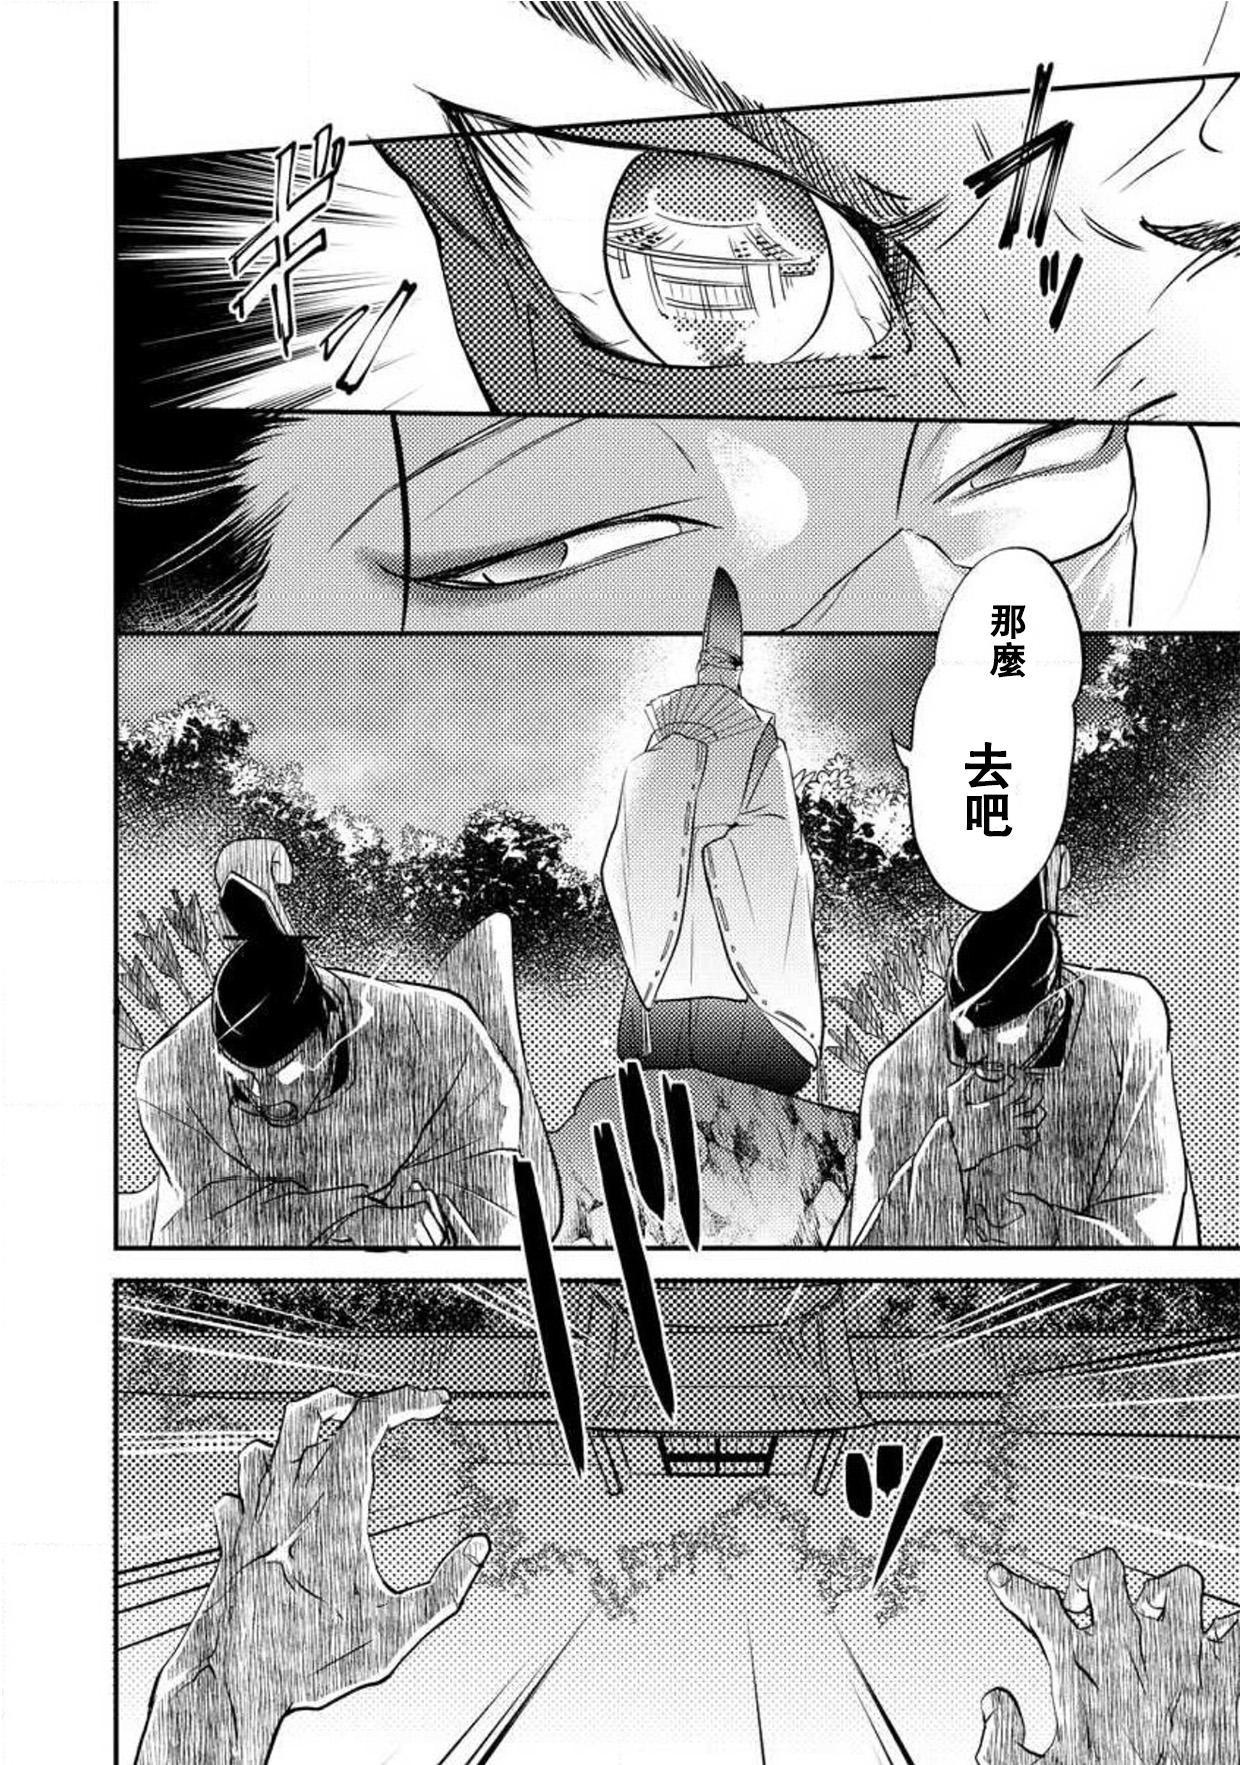 Oeyama suimutan utsukushiki oni no toraware hime | 大江山醉夢逸話 美麗的鬼與被囚禁的公主 Ch. 1-8 205